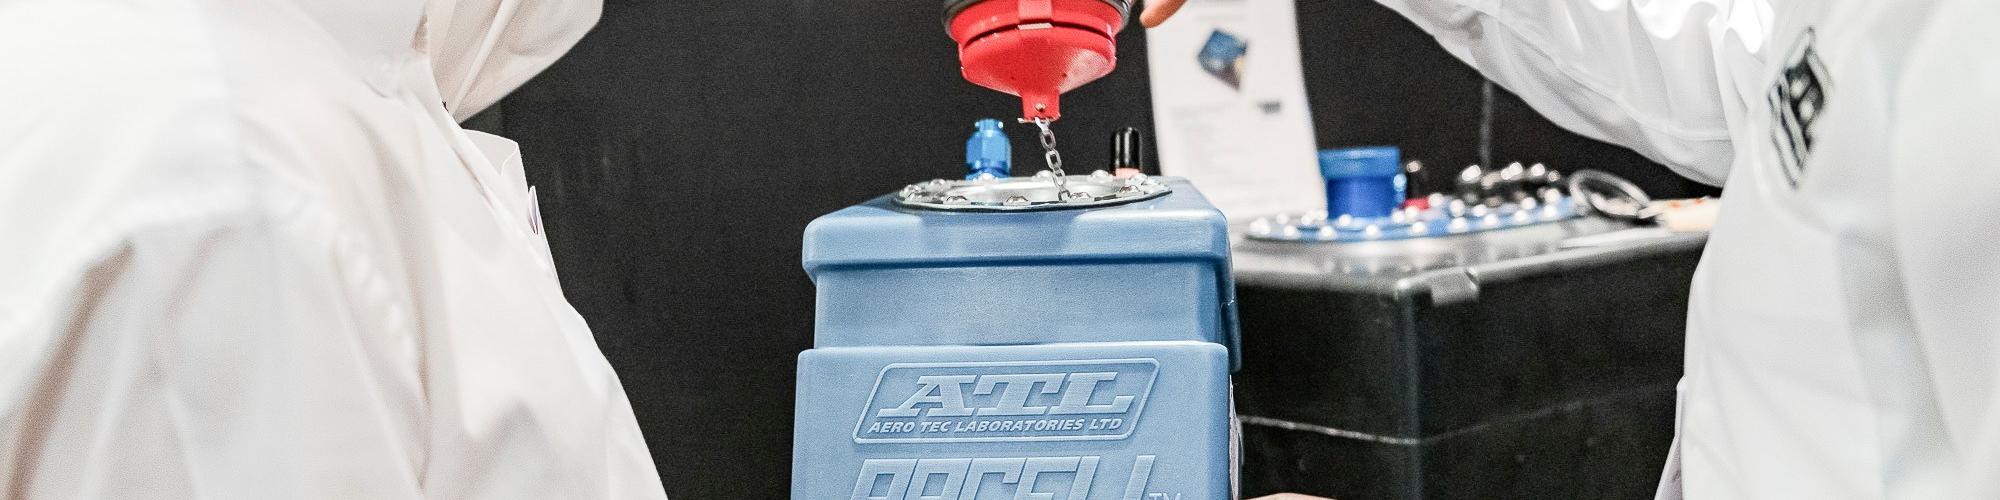 Aero Tec Laboratories LTD  cover image